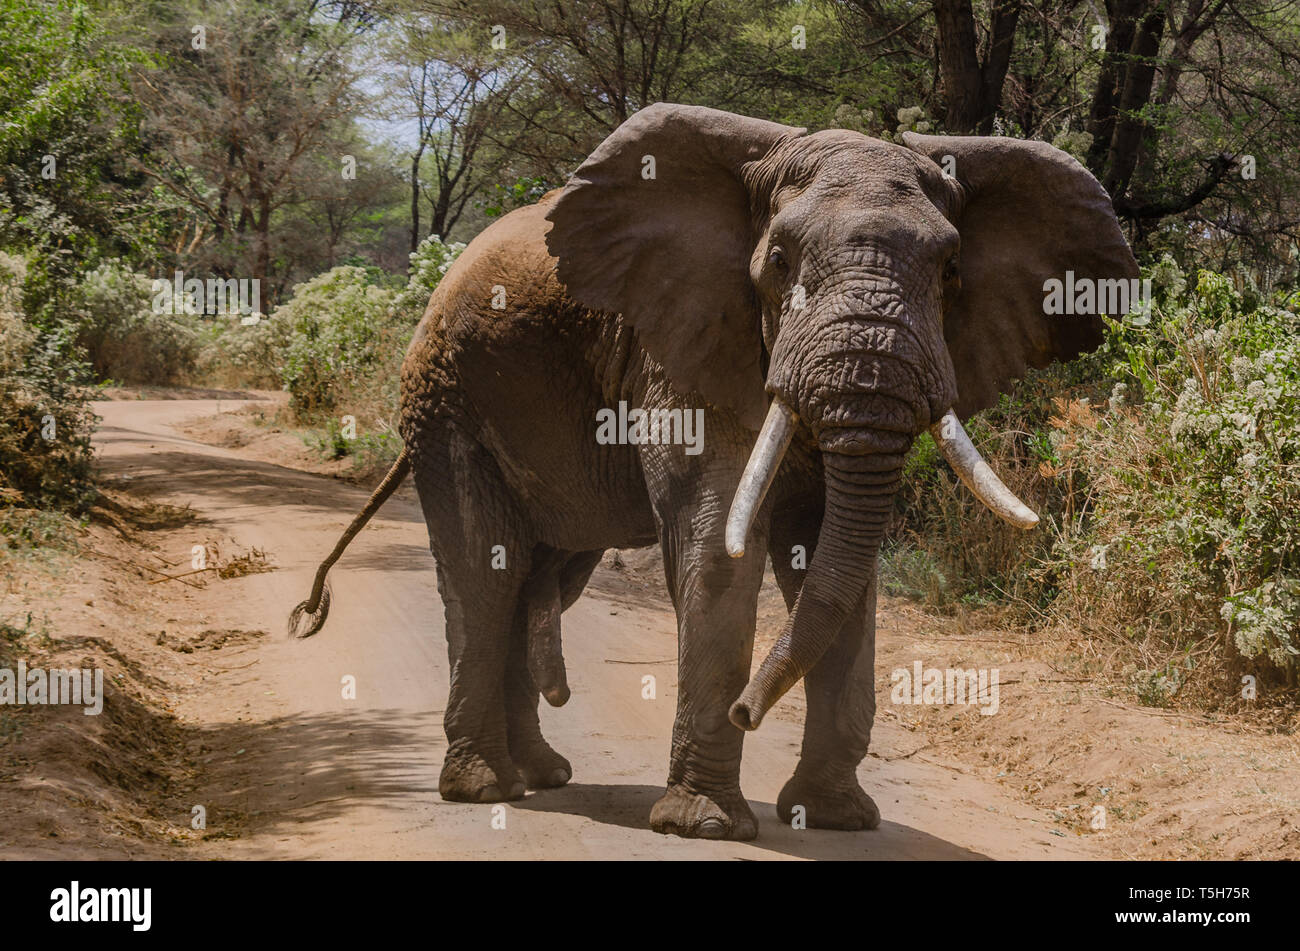 Bull Elephant Blocking the Road in Lake Manyara National Park, Tanzania, Africa - Stock Image